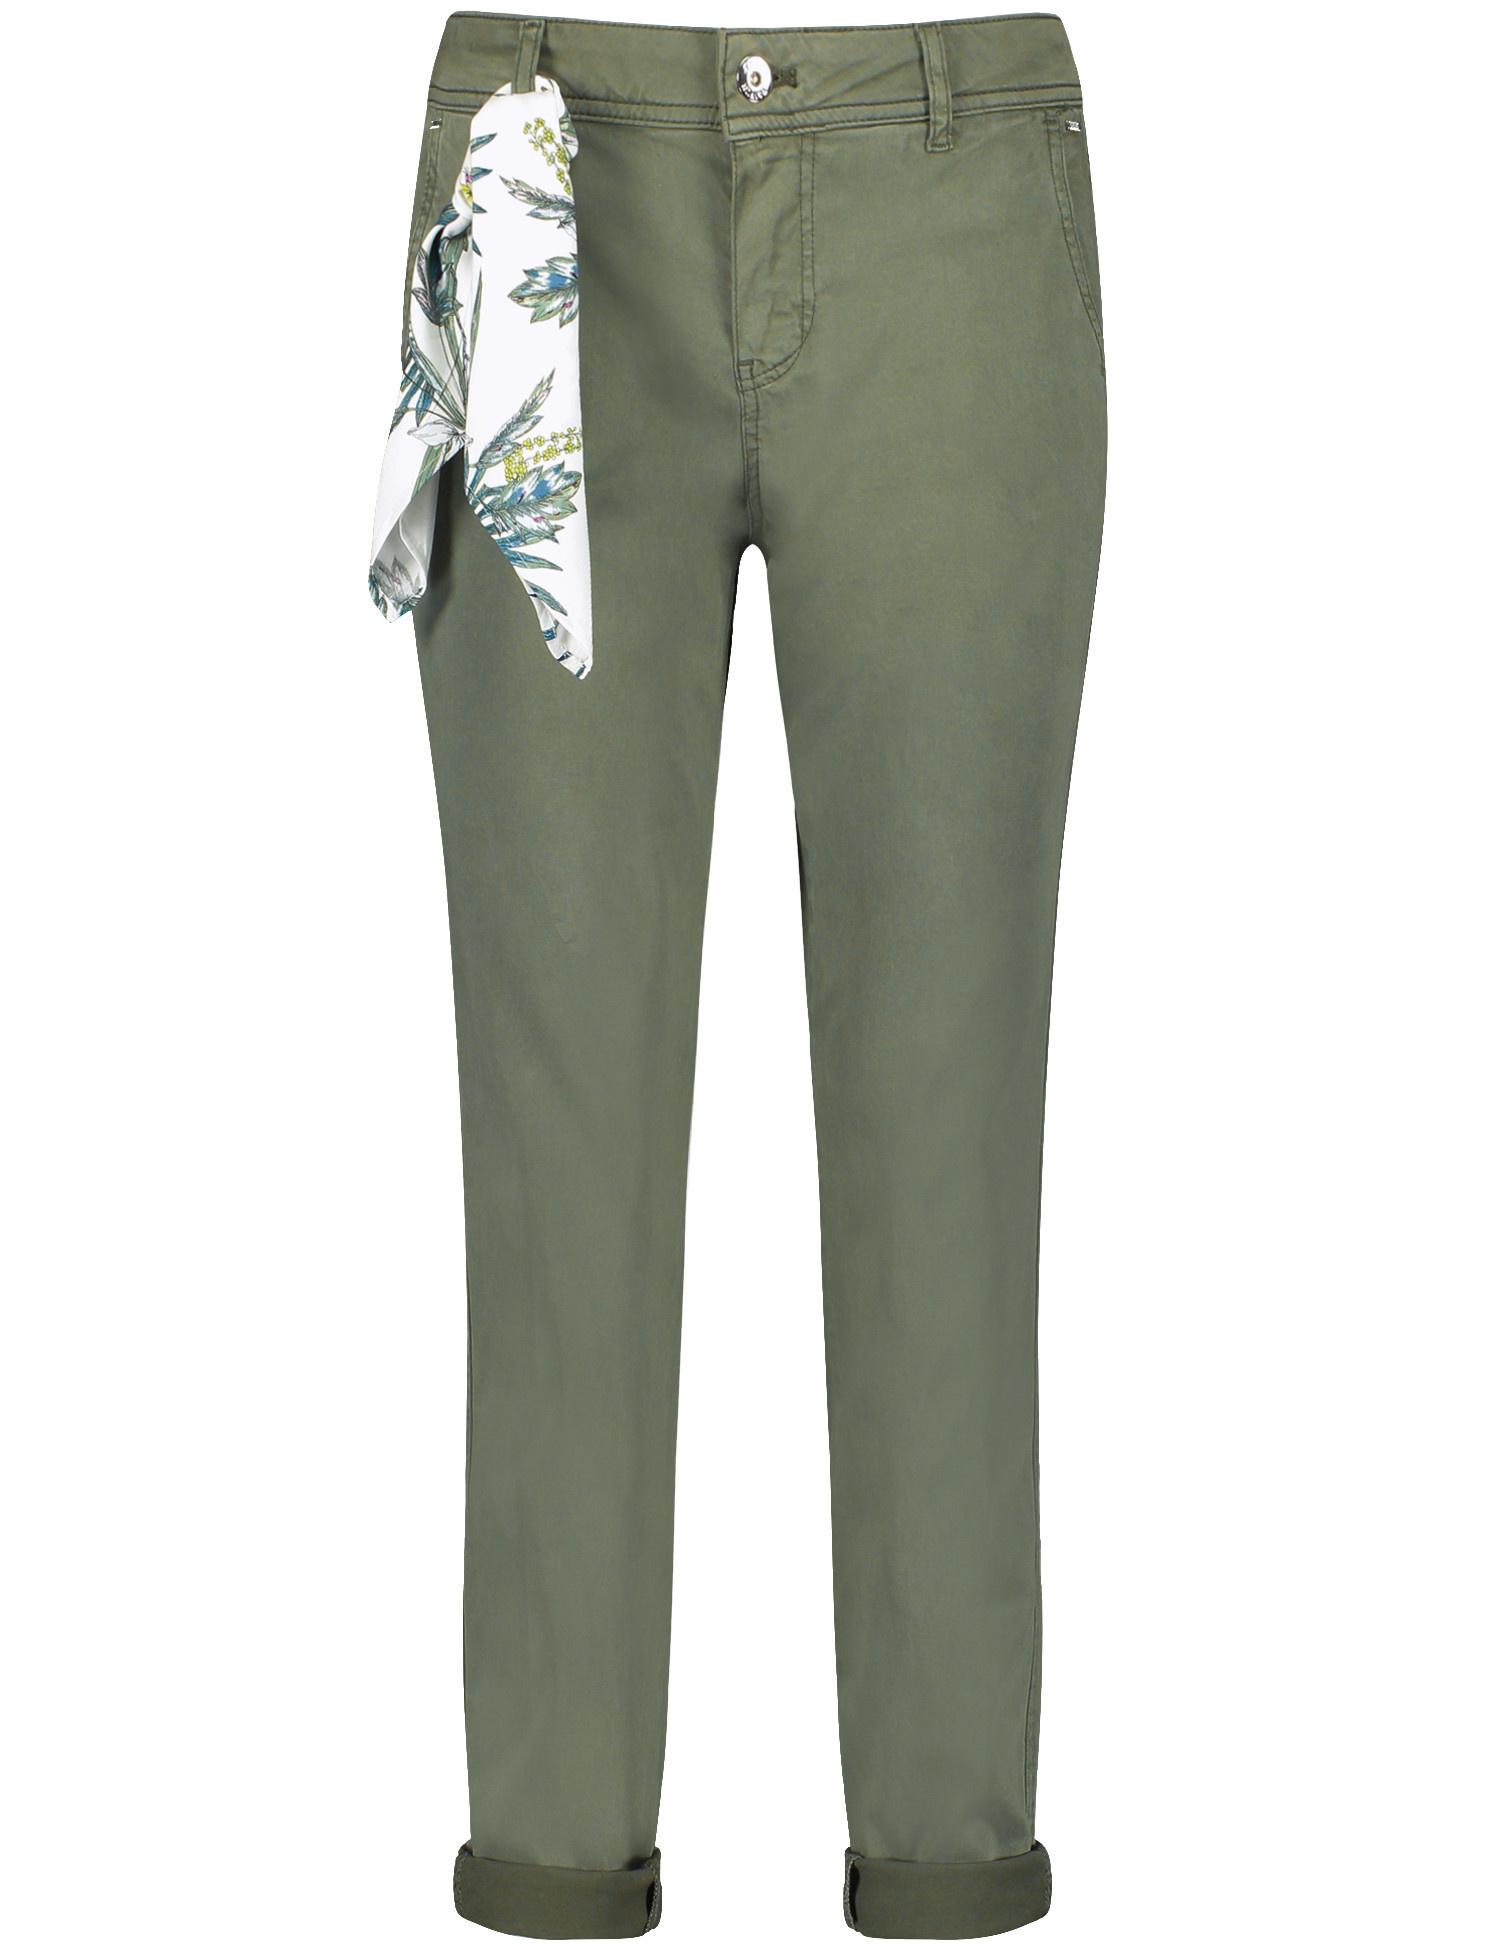 TAIFUN pantalon chino-1